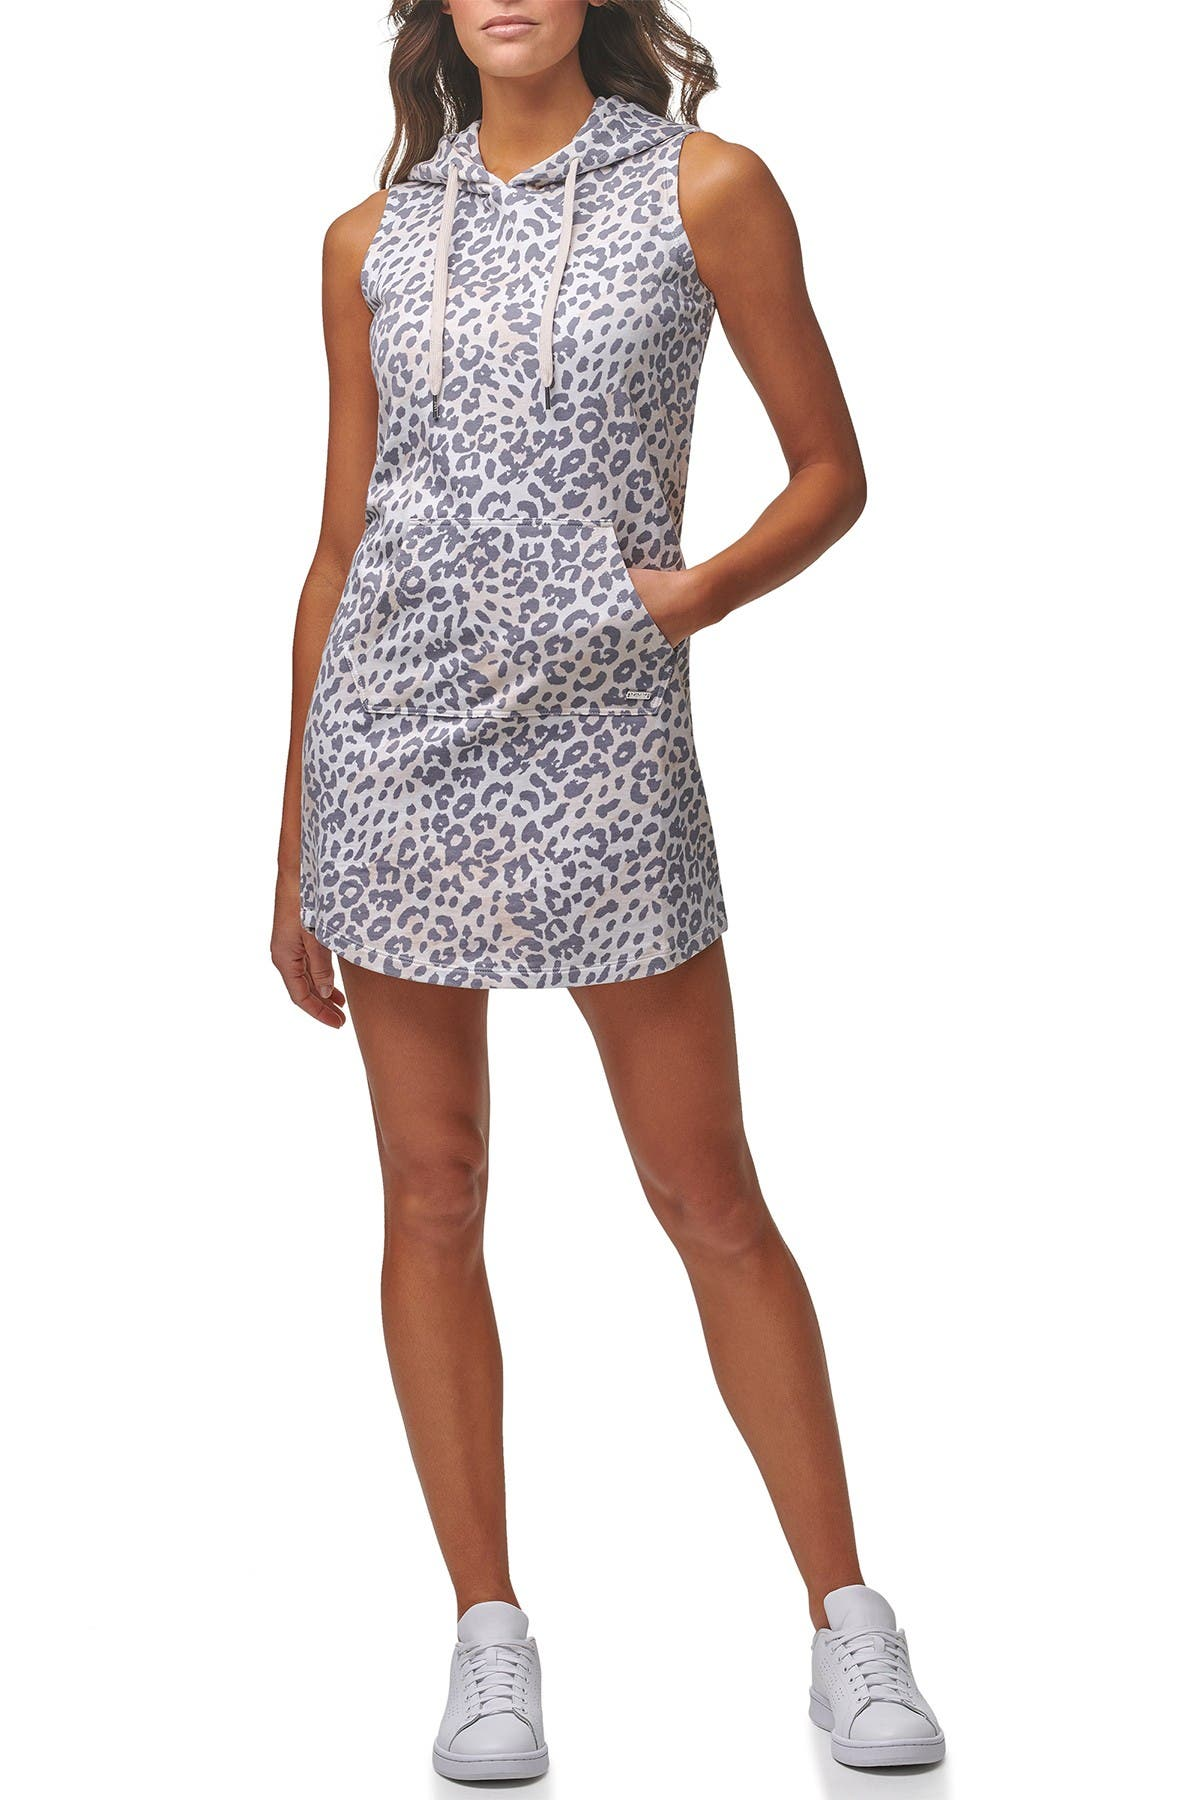 Image of MARC NEW YORK PERFORMANCE Leopard Drawstring Hoodie Dress